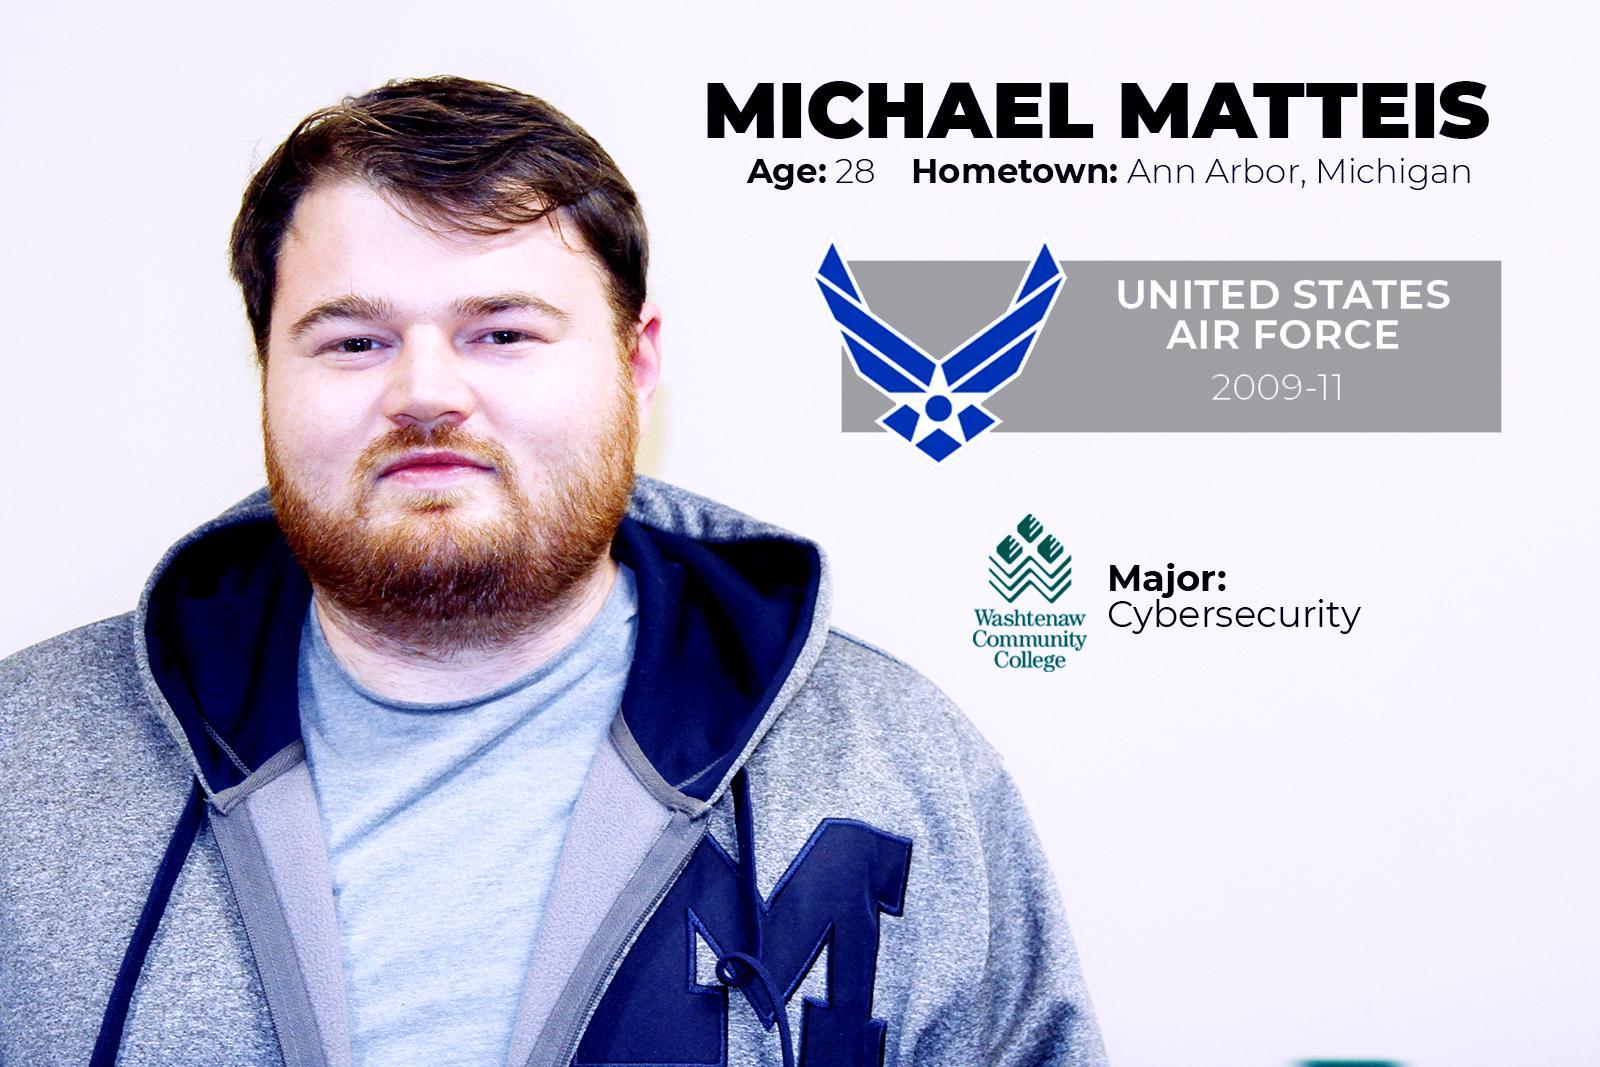 Michael Matteis